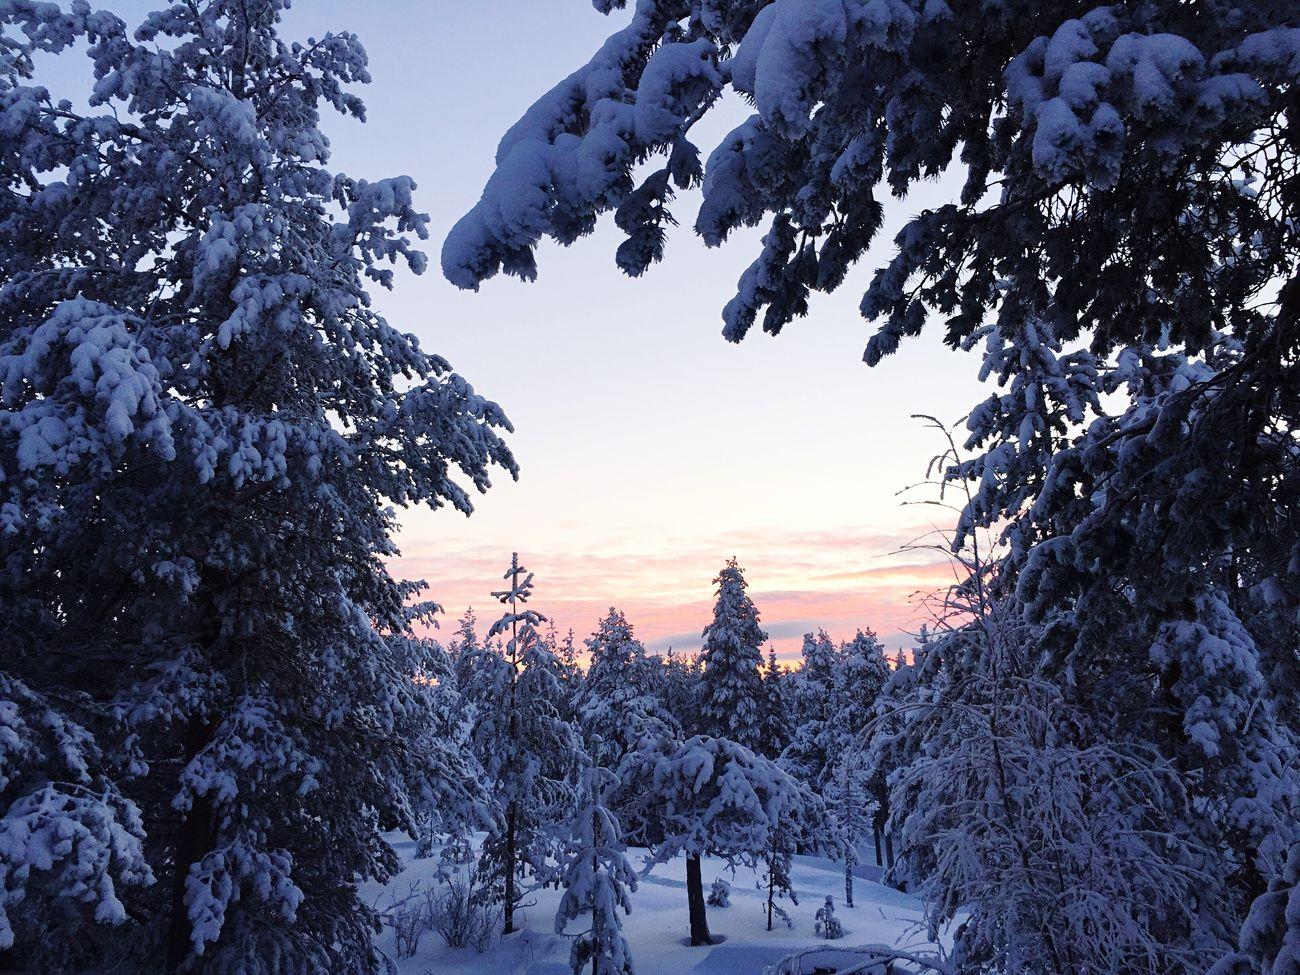 Gün doğmasıyla batması bir olan ülke 🙃 Finland Winter Snow Cold Temperature Nature Beauty In Nature No People EyeEm Nature Lover EyeEm EyeEm Gallery EyeEmBestPics EyeEm Best Shots - Landscape Sunset Hanging Out Lapland Lapland, Finland Rovaniemi Taking Photo